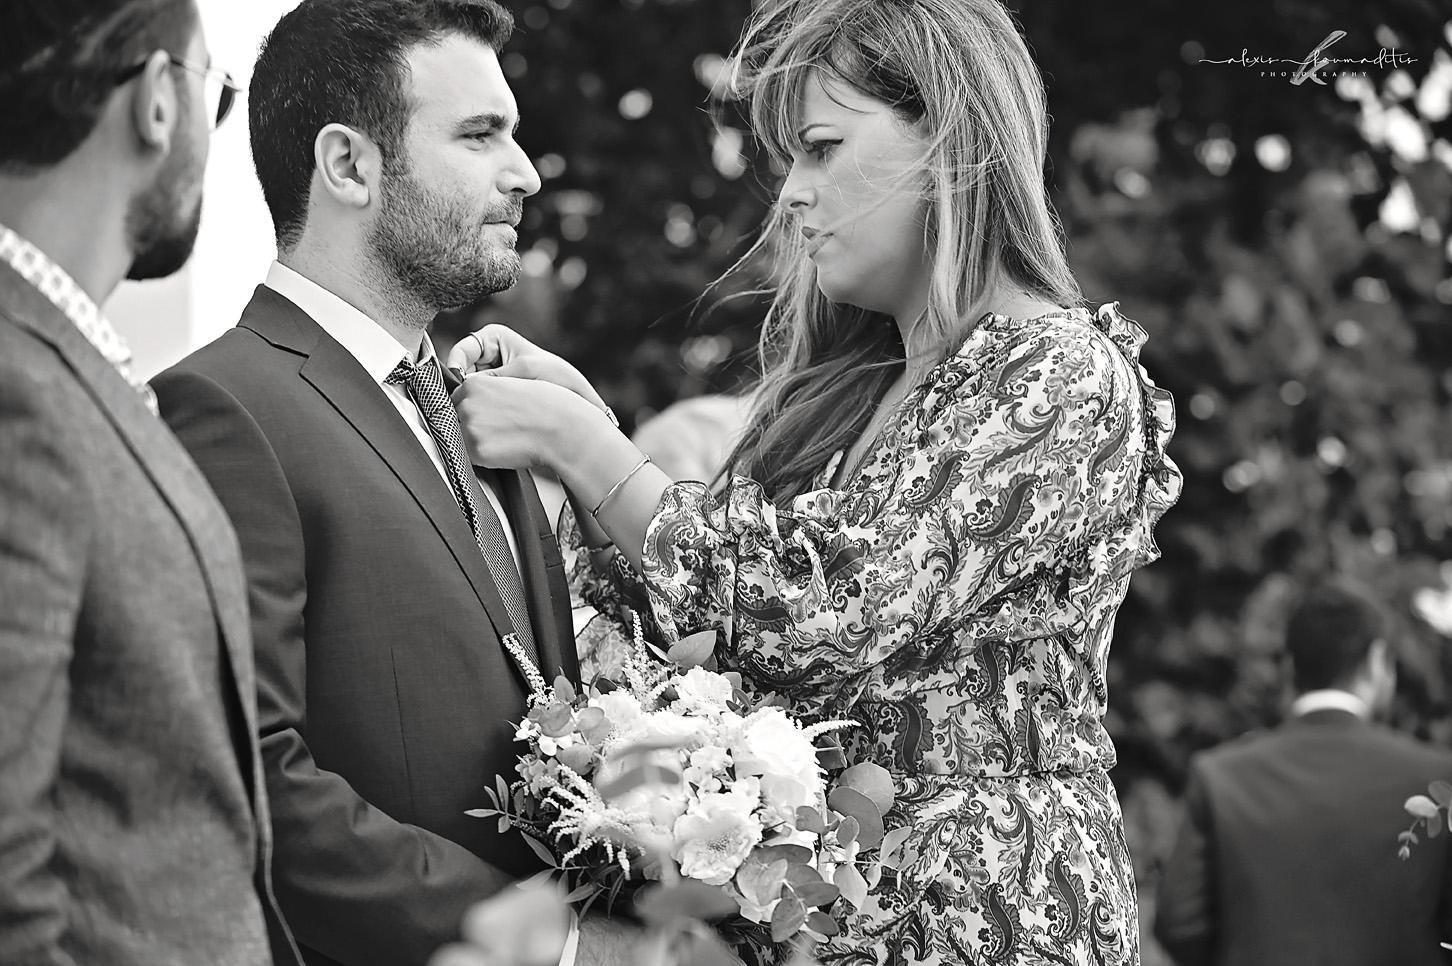 wedding-photography-platamonas -love-bride-groom-alexis-koumaditis